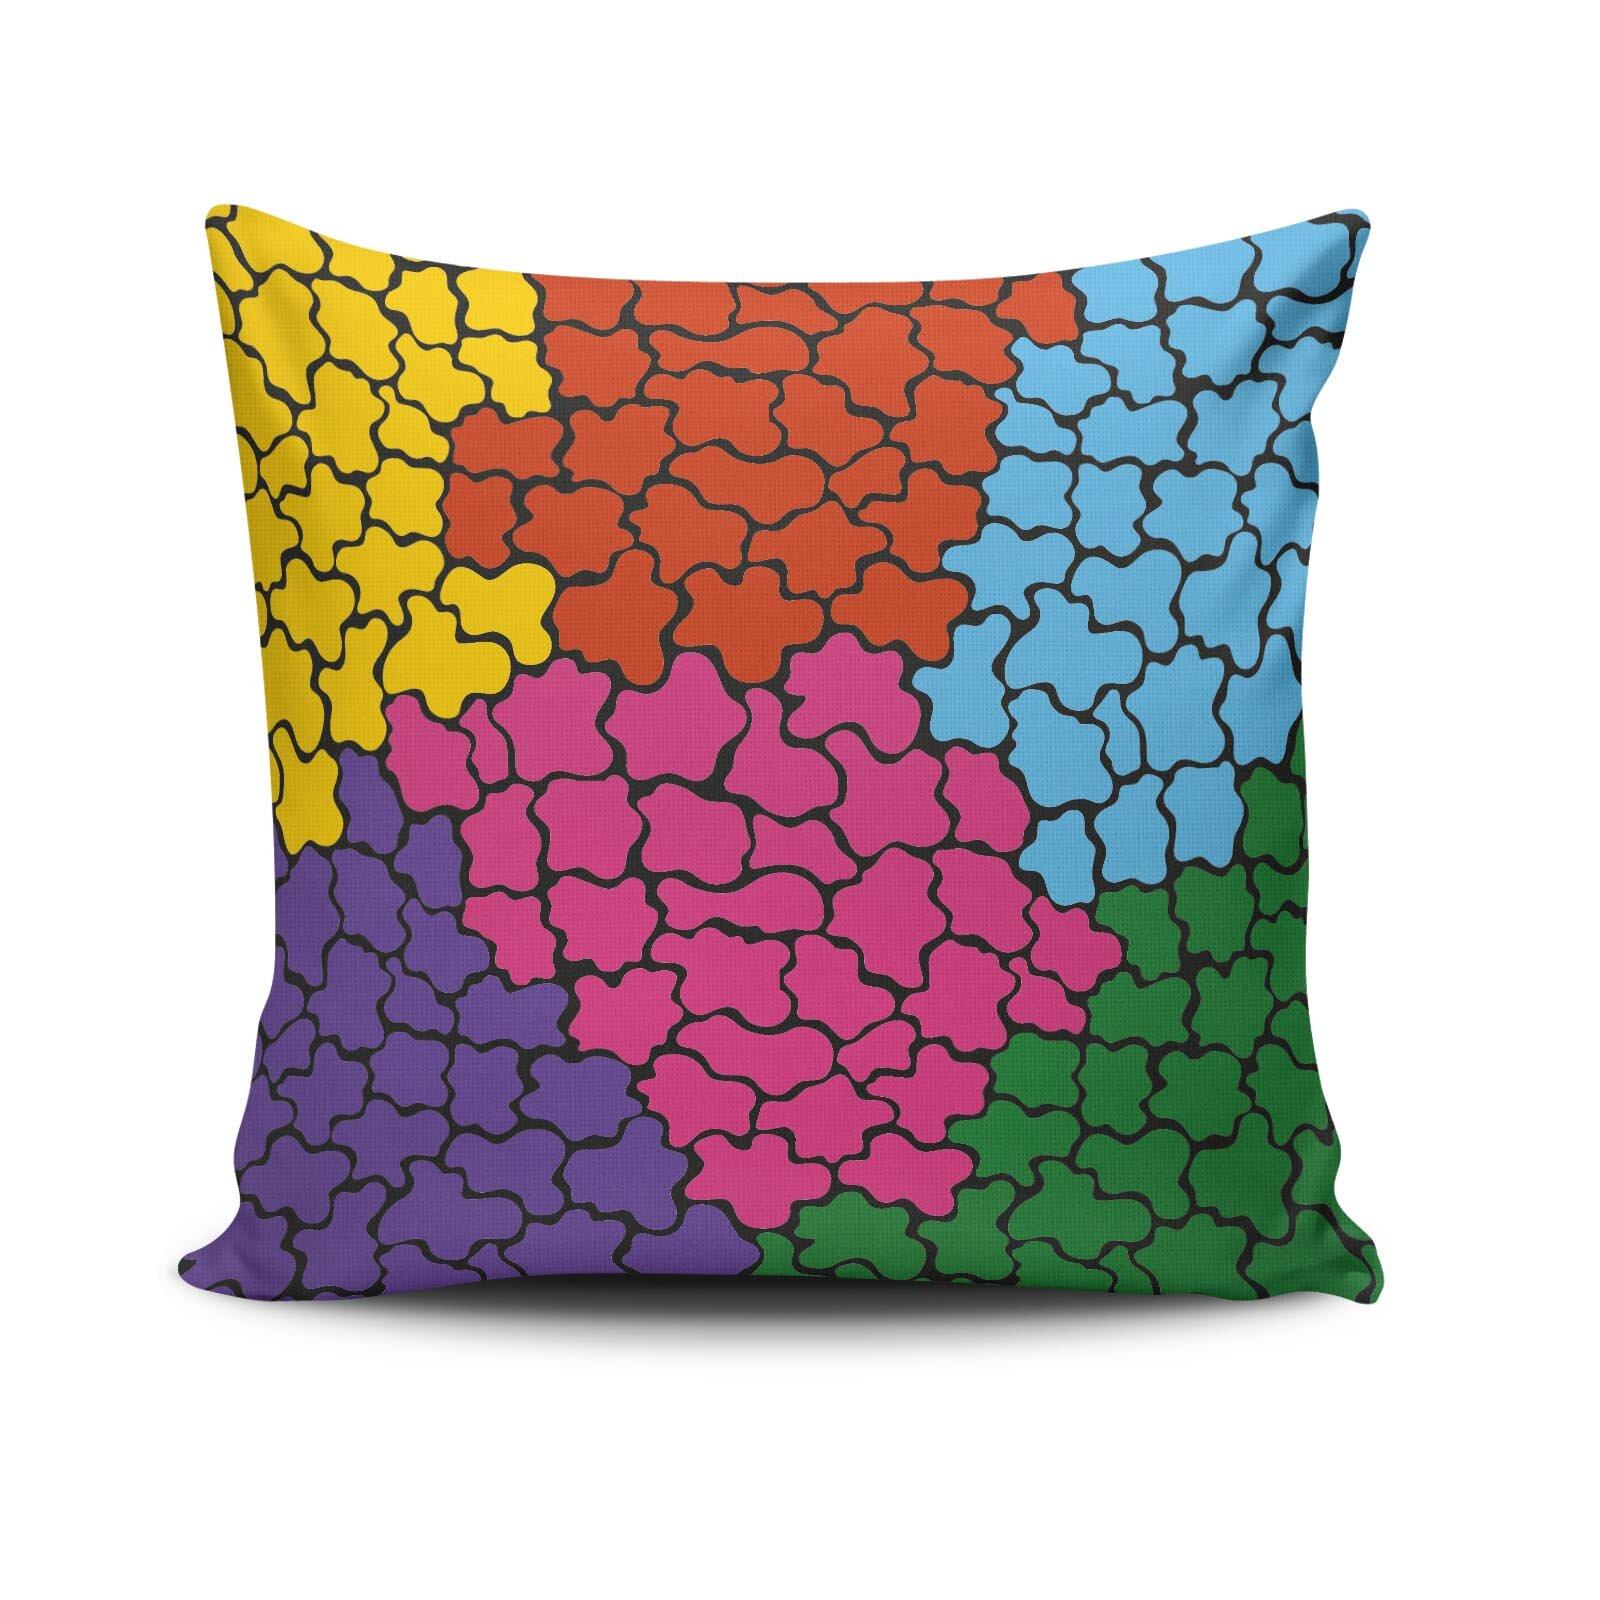 Fata de perna Cushion Love, dimensiune 45 x 45 cm, Material: 50% Bumbac / 50% Poliester